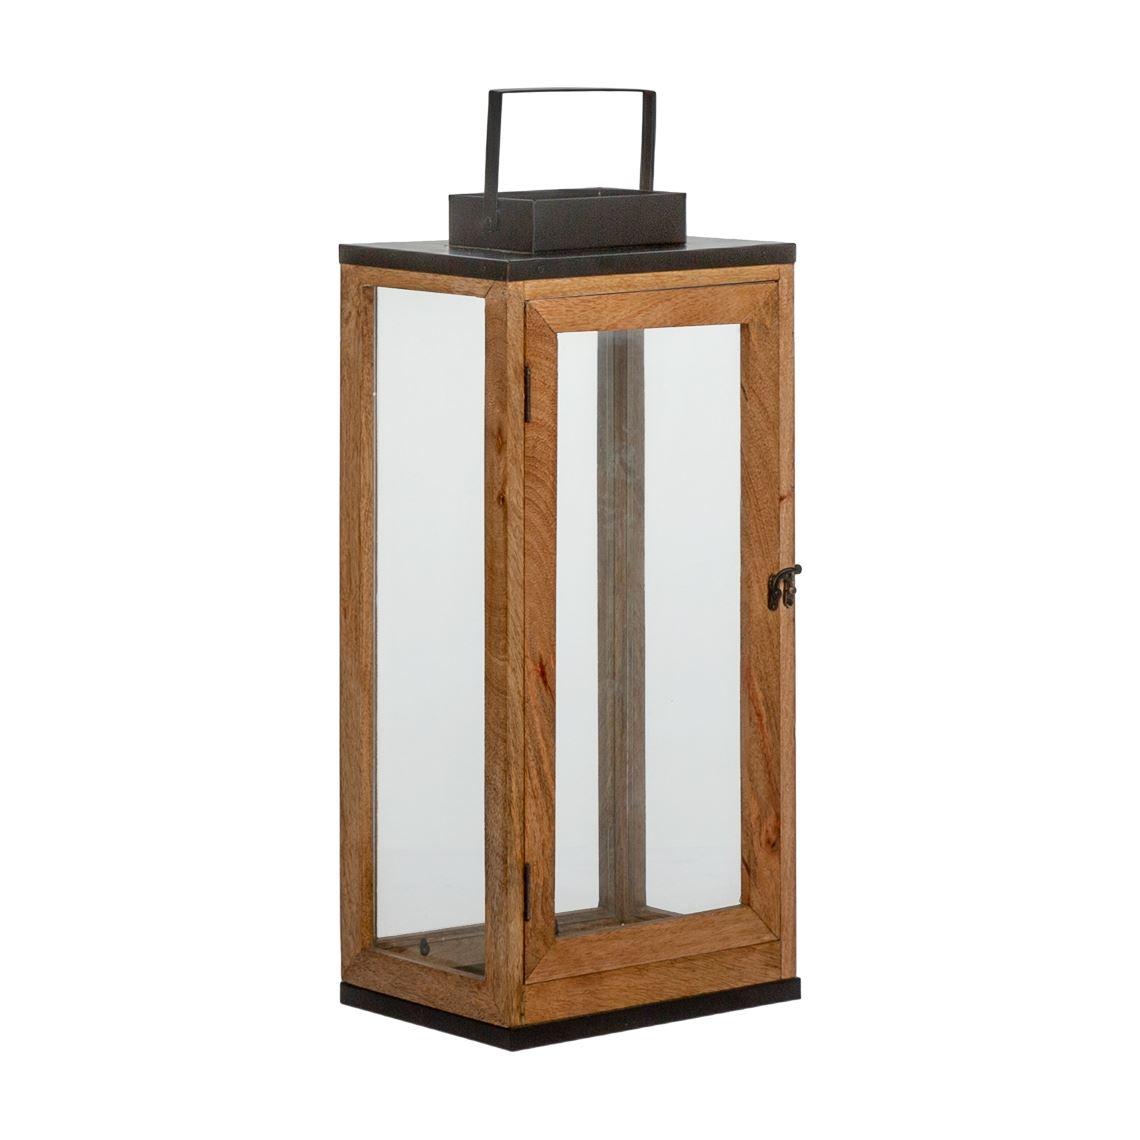 Anafi Lantern Size W 24cm x D 18cm x H 51cm in Black Freedom